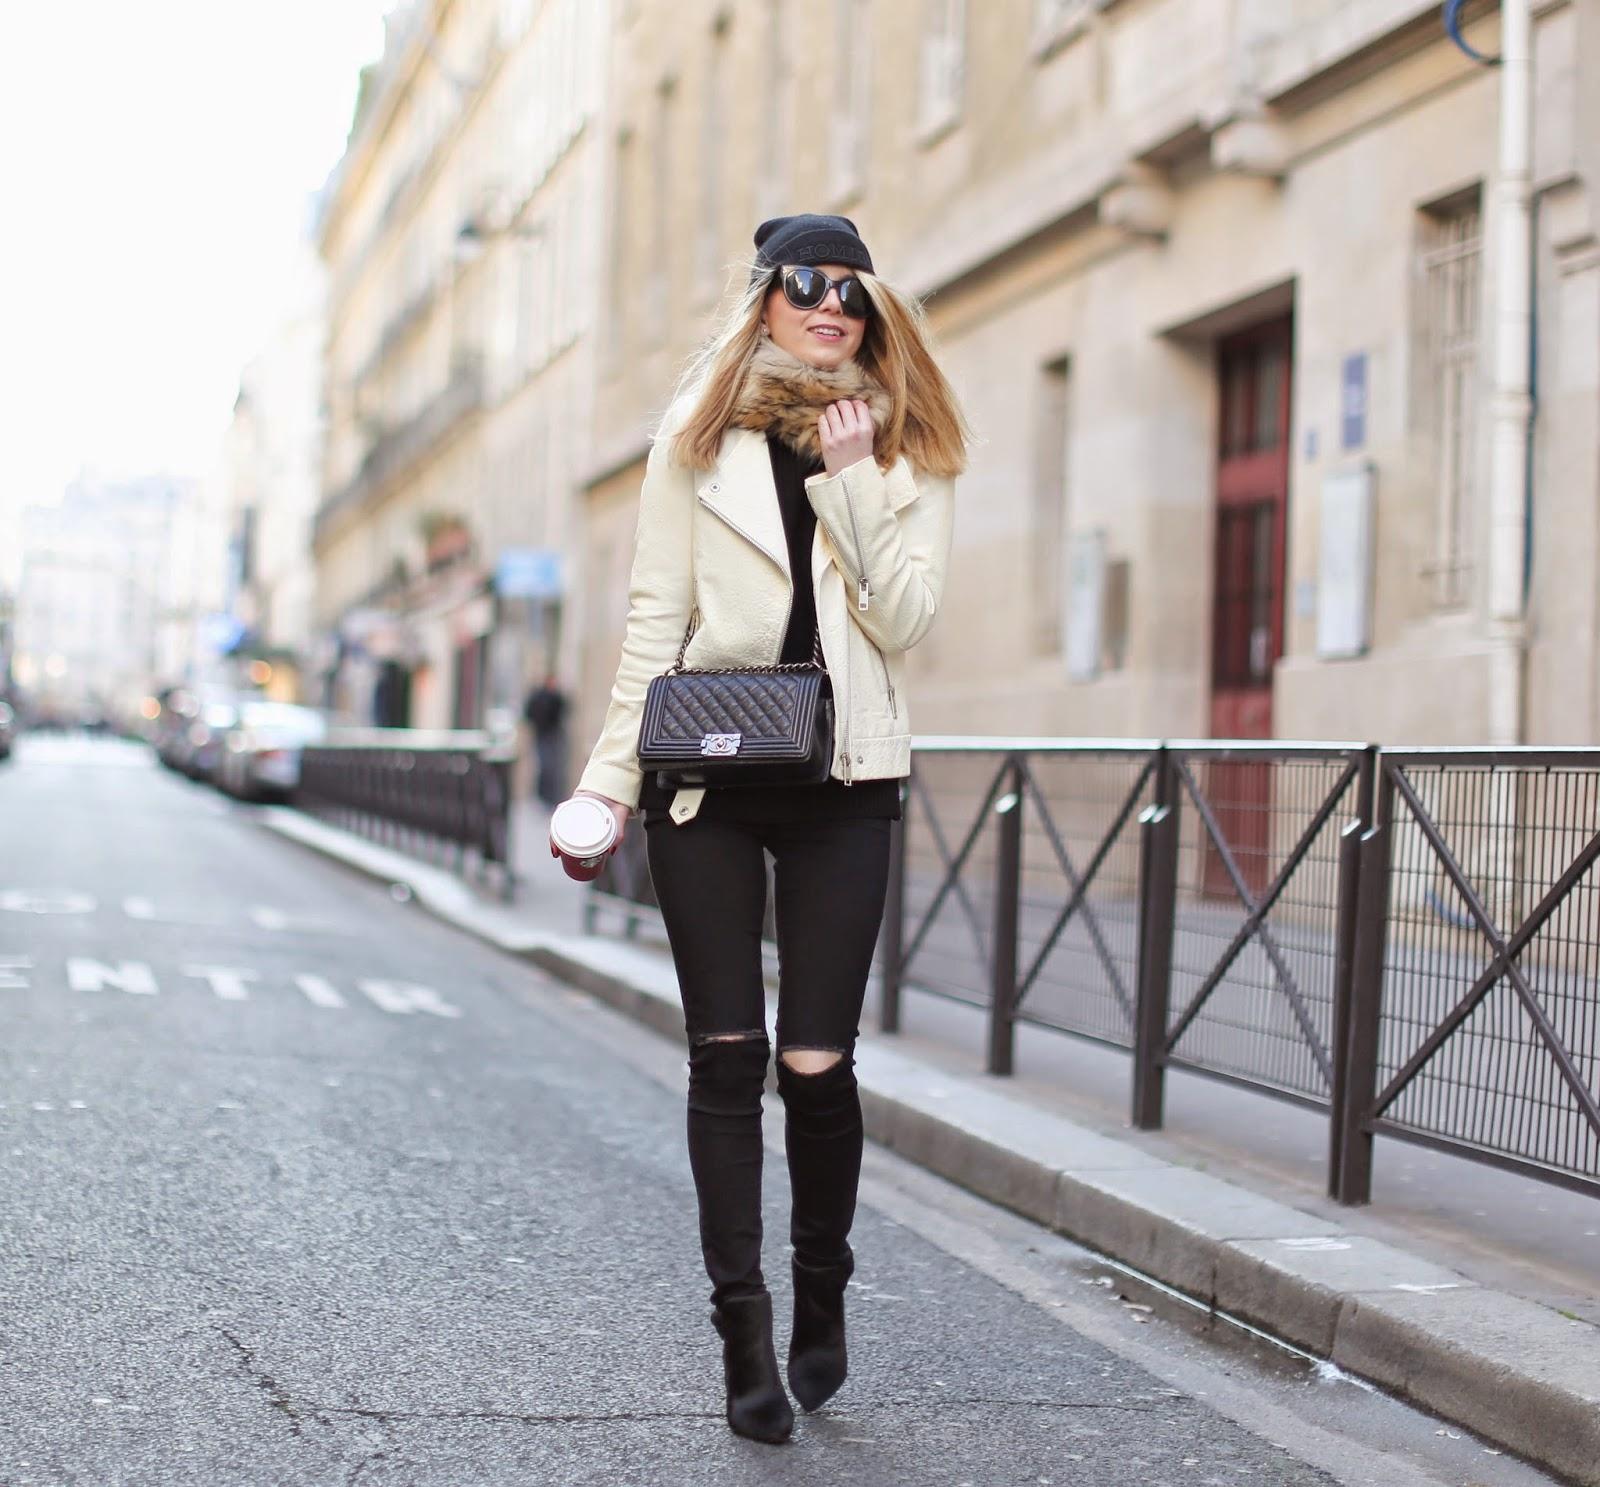 zara, topshop, homies, black and white, chanel, streetstyle, fashion blogger, paris